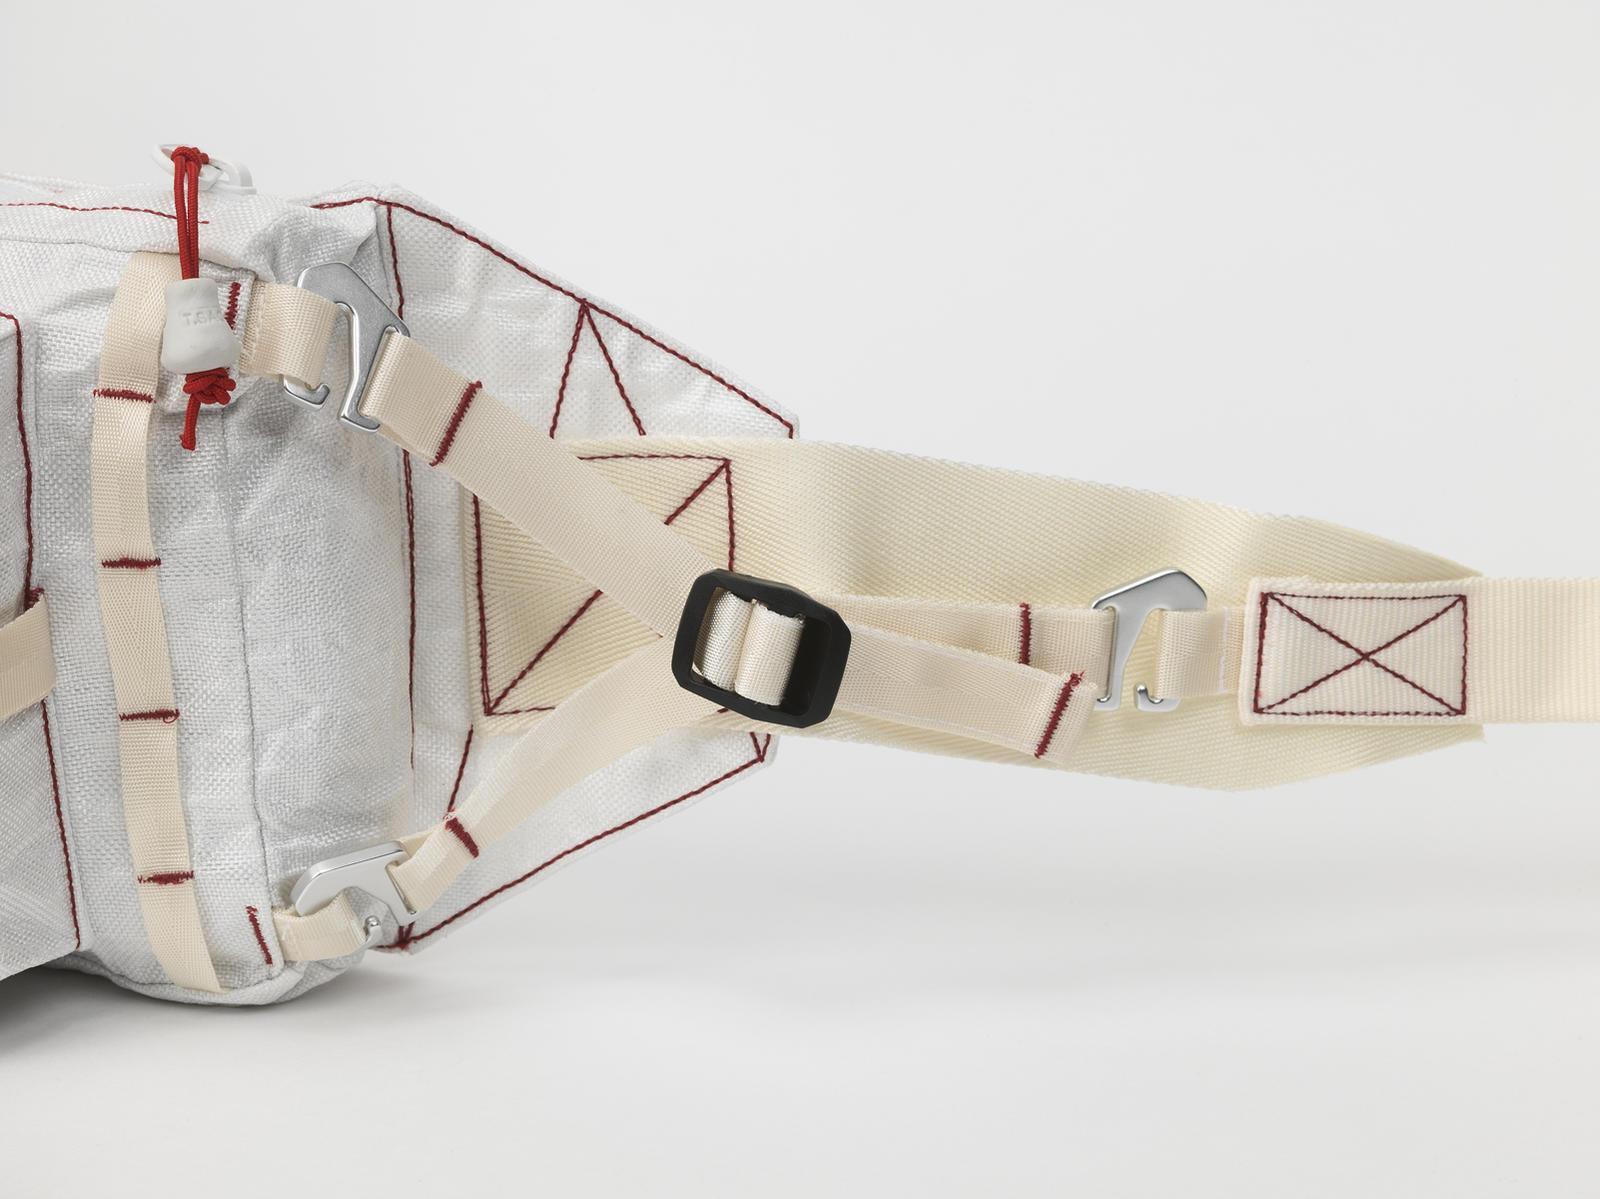 Tom Sachs讲述Nike x Tom Sachs Poncho斗篷设计背后的故事